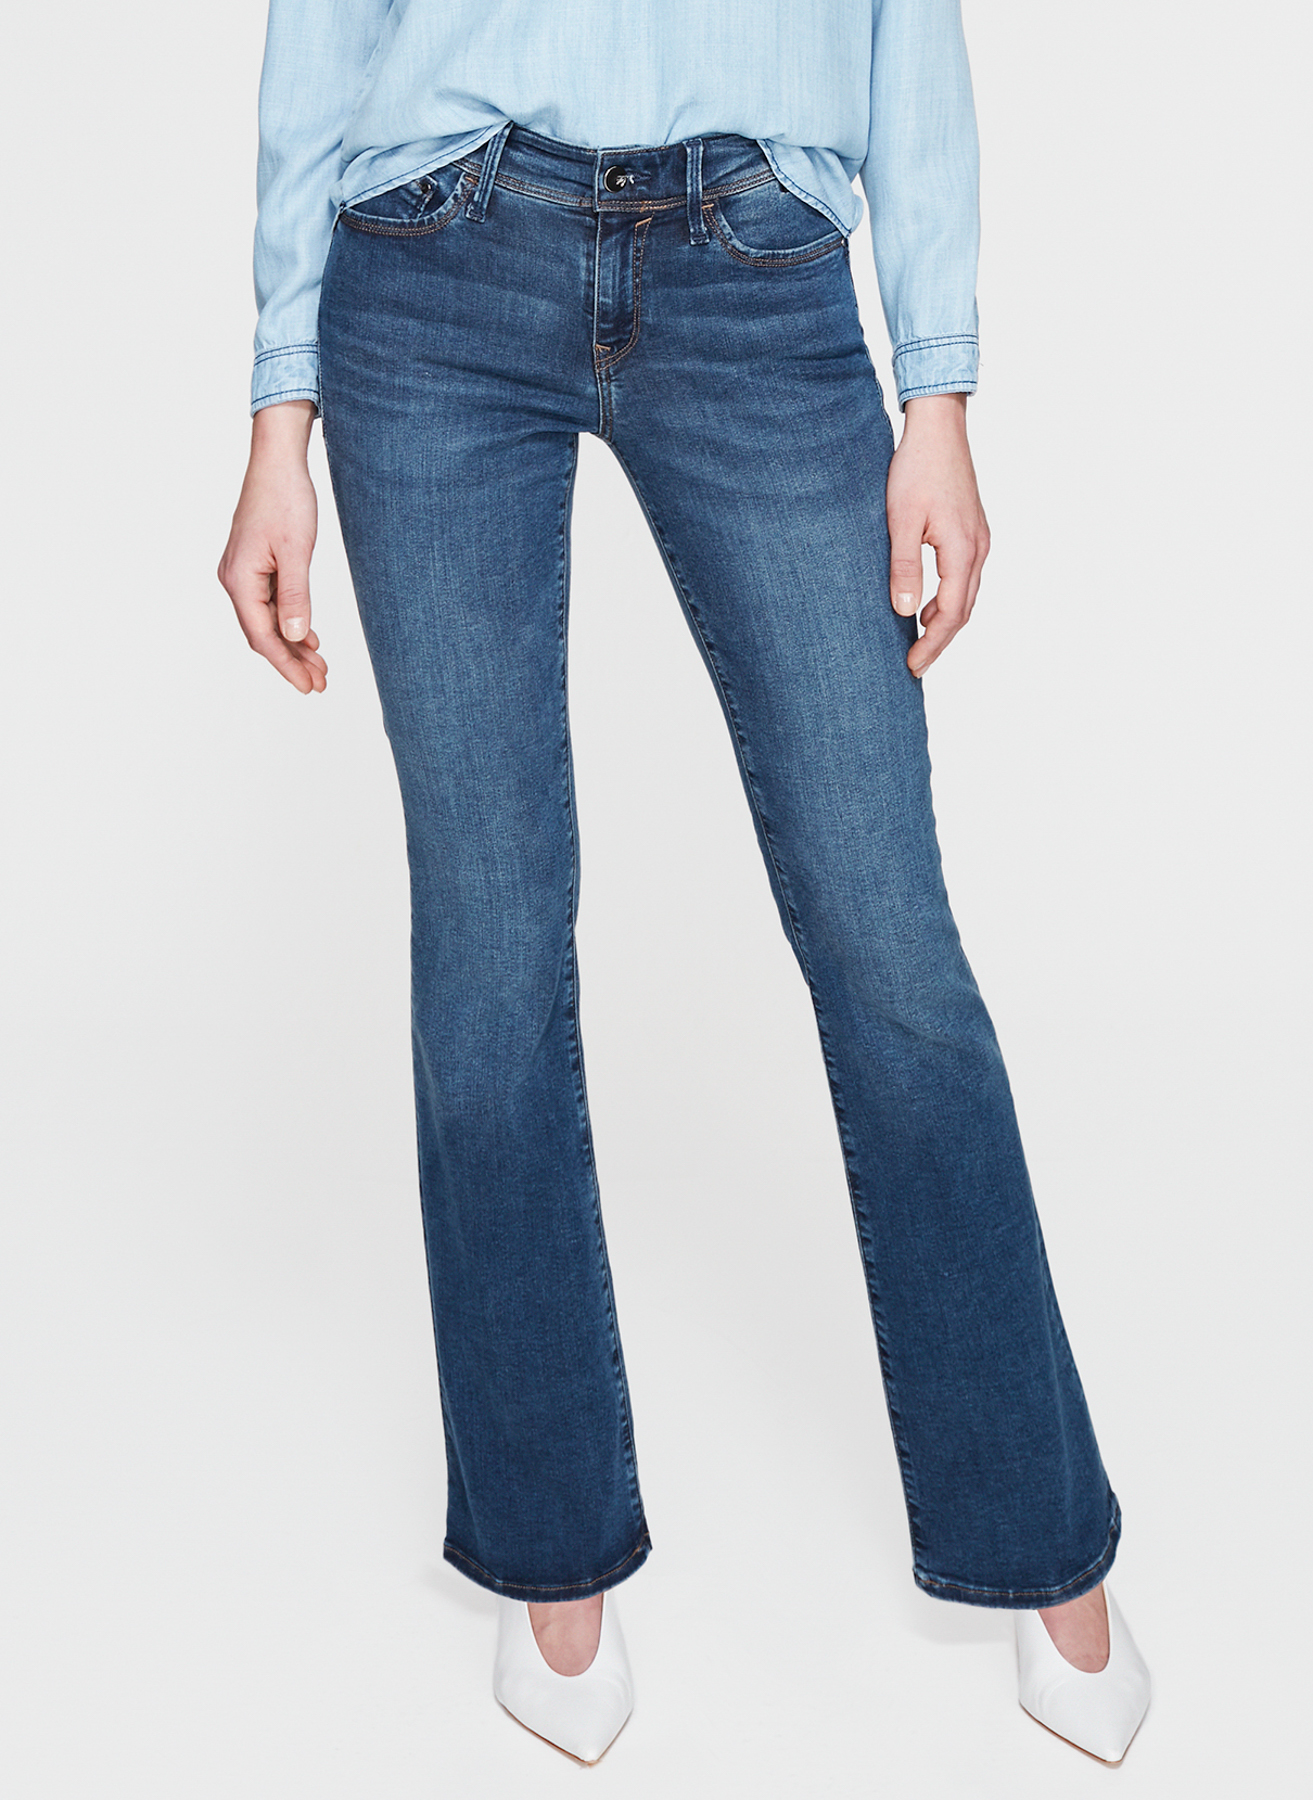 8bc0176e40eb4 31-30 Renksiz Mavi Molly Dark Shaded Gold Lüx Move Denim Pantolon  5002361907029 Kadın Giyim